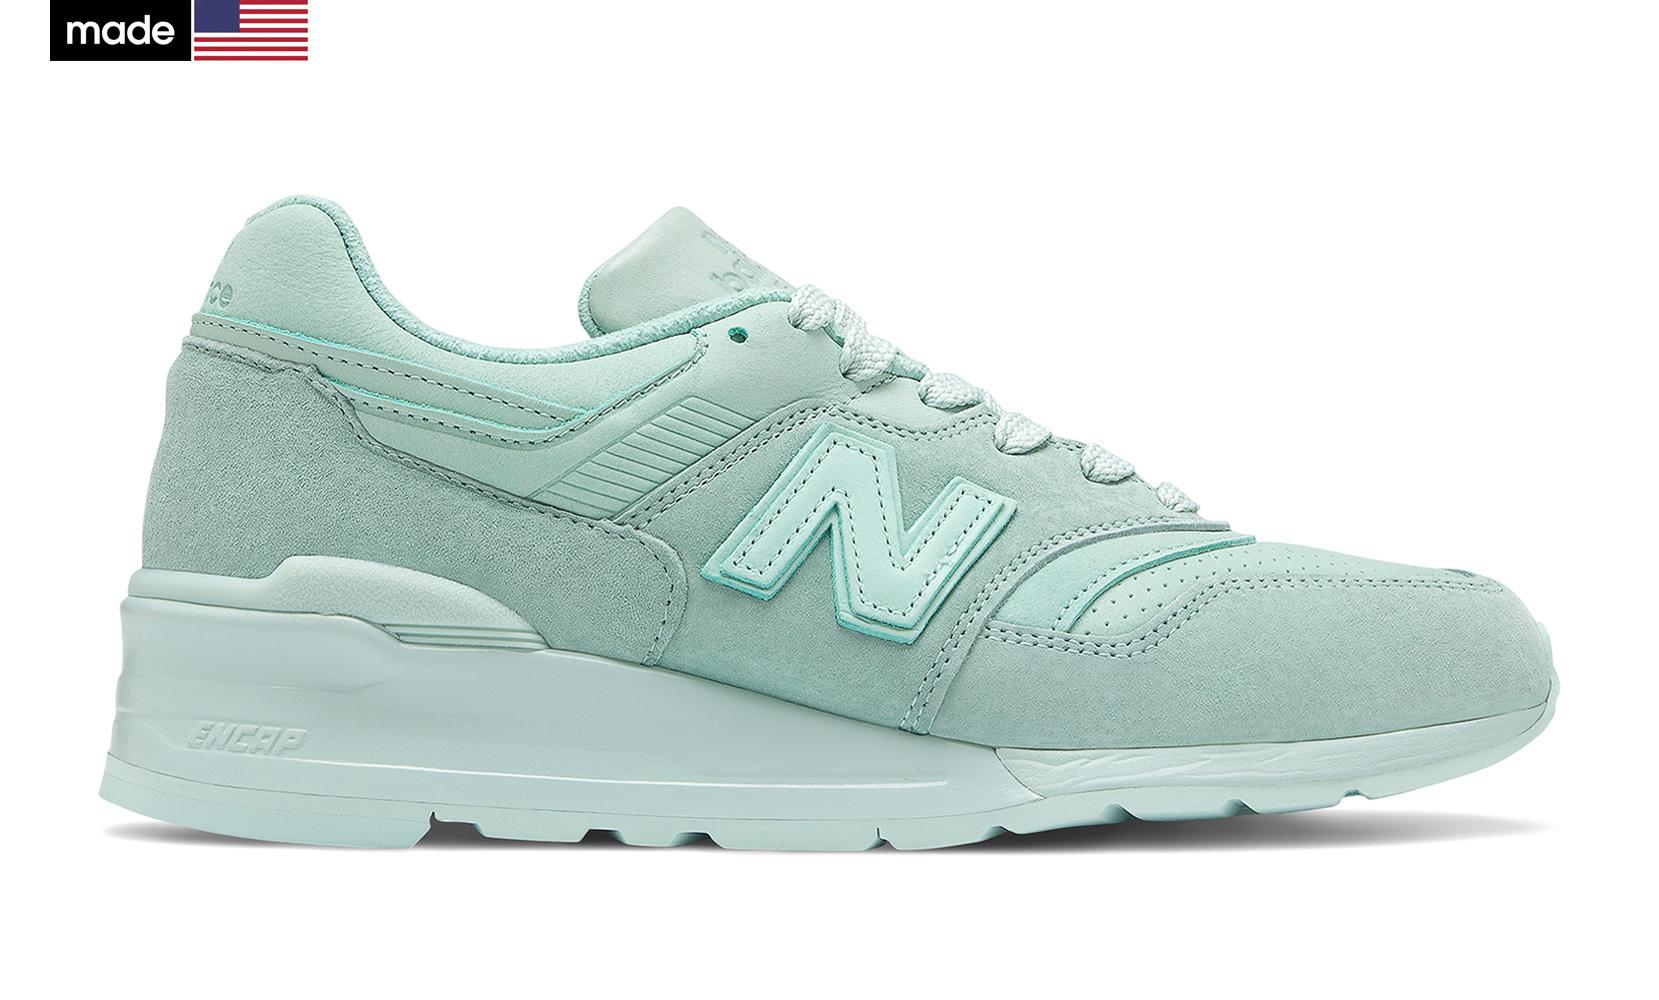 Жіноче взуття повсякденне New Balance 997 Made in USA M997LBE | New Balance